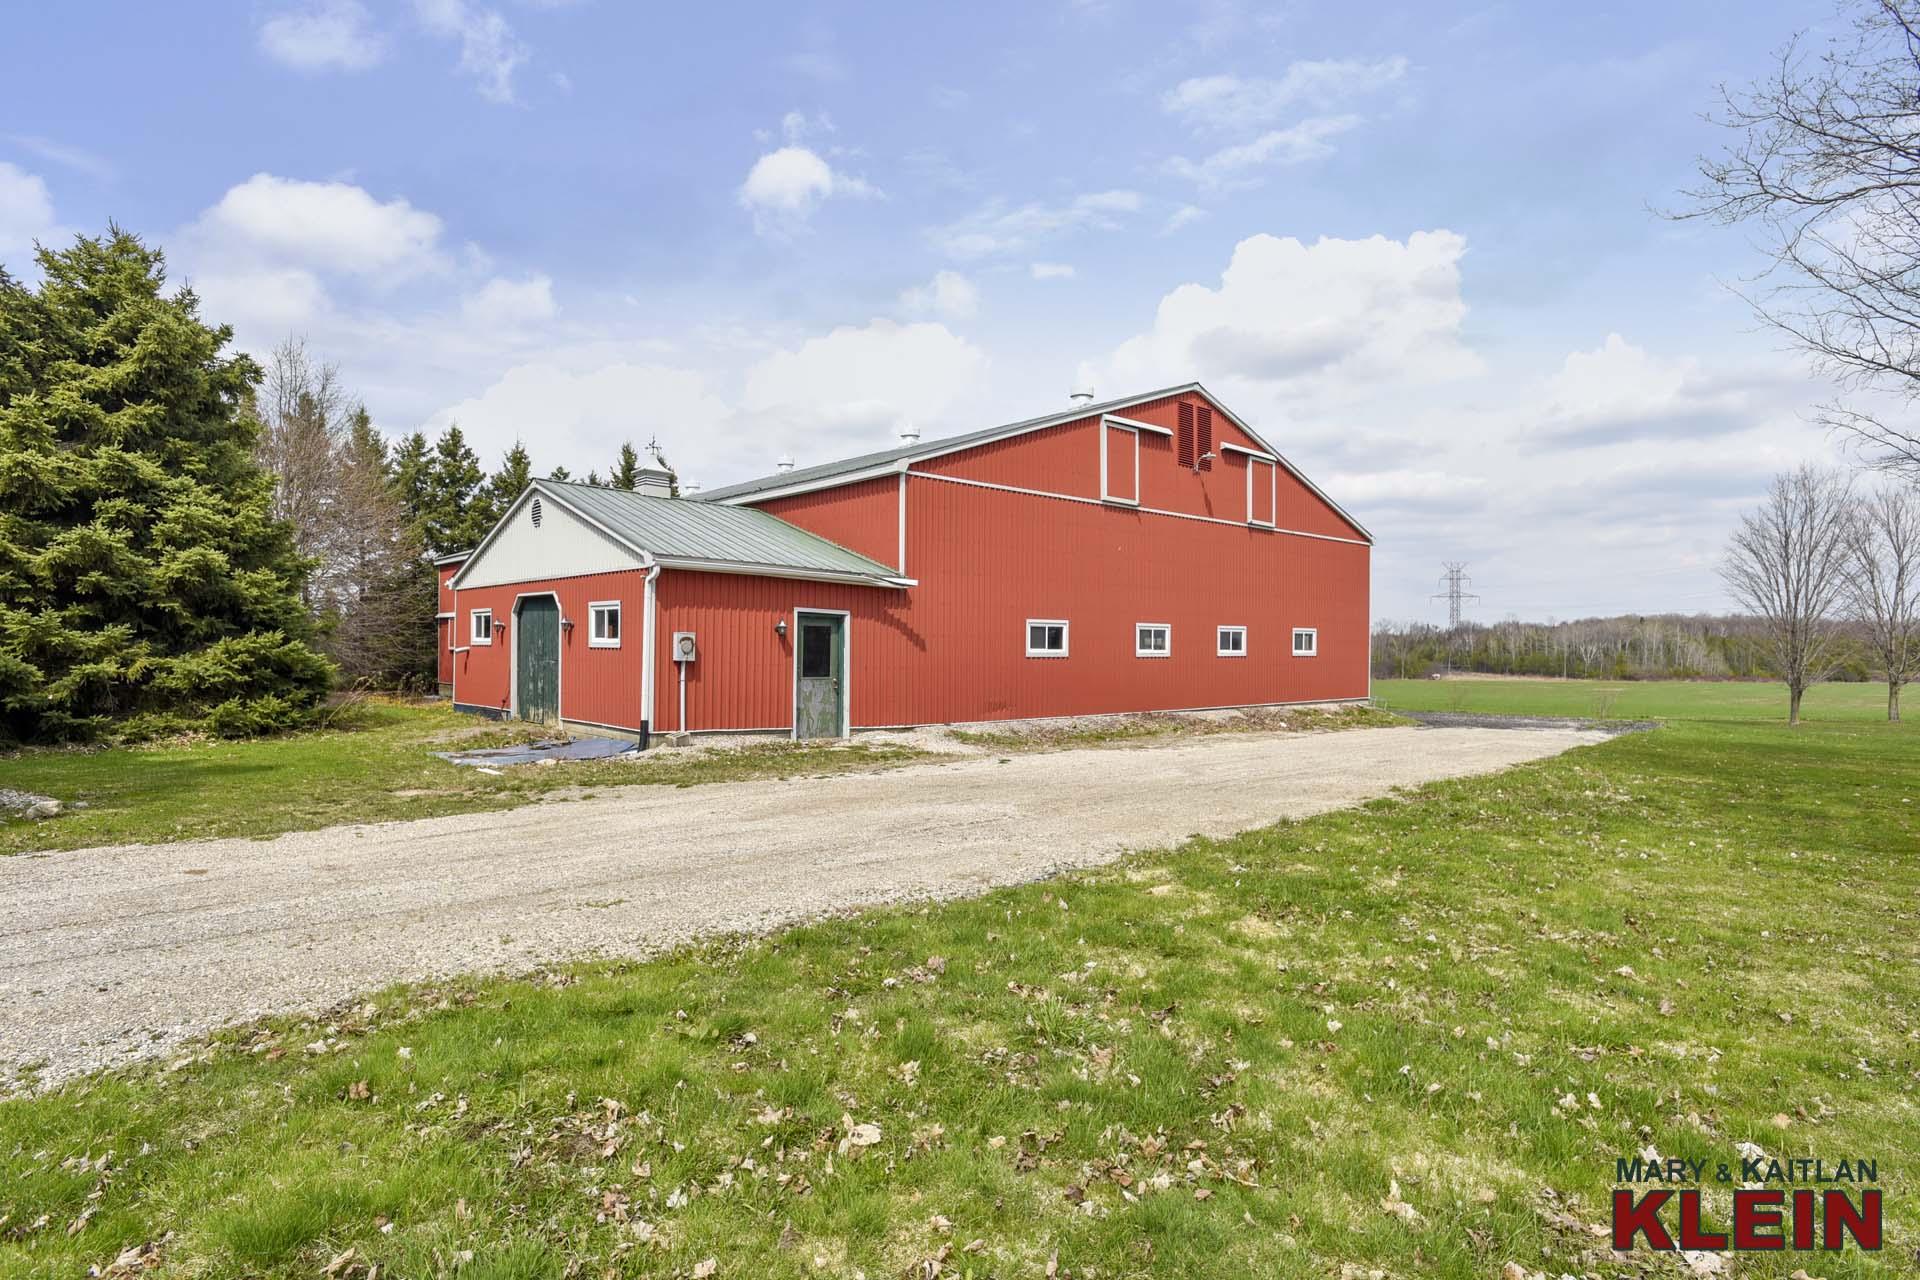 Farm, Stables, Workshop, private entry, hay storage loft